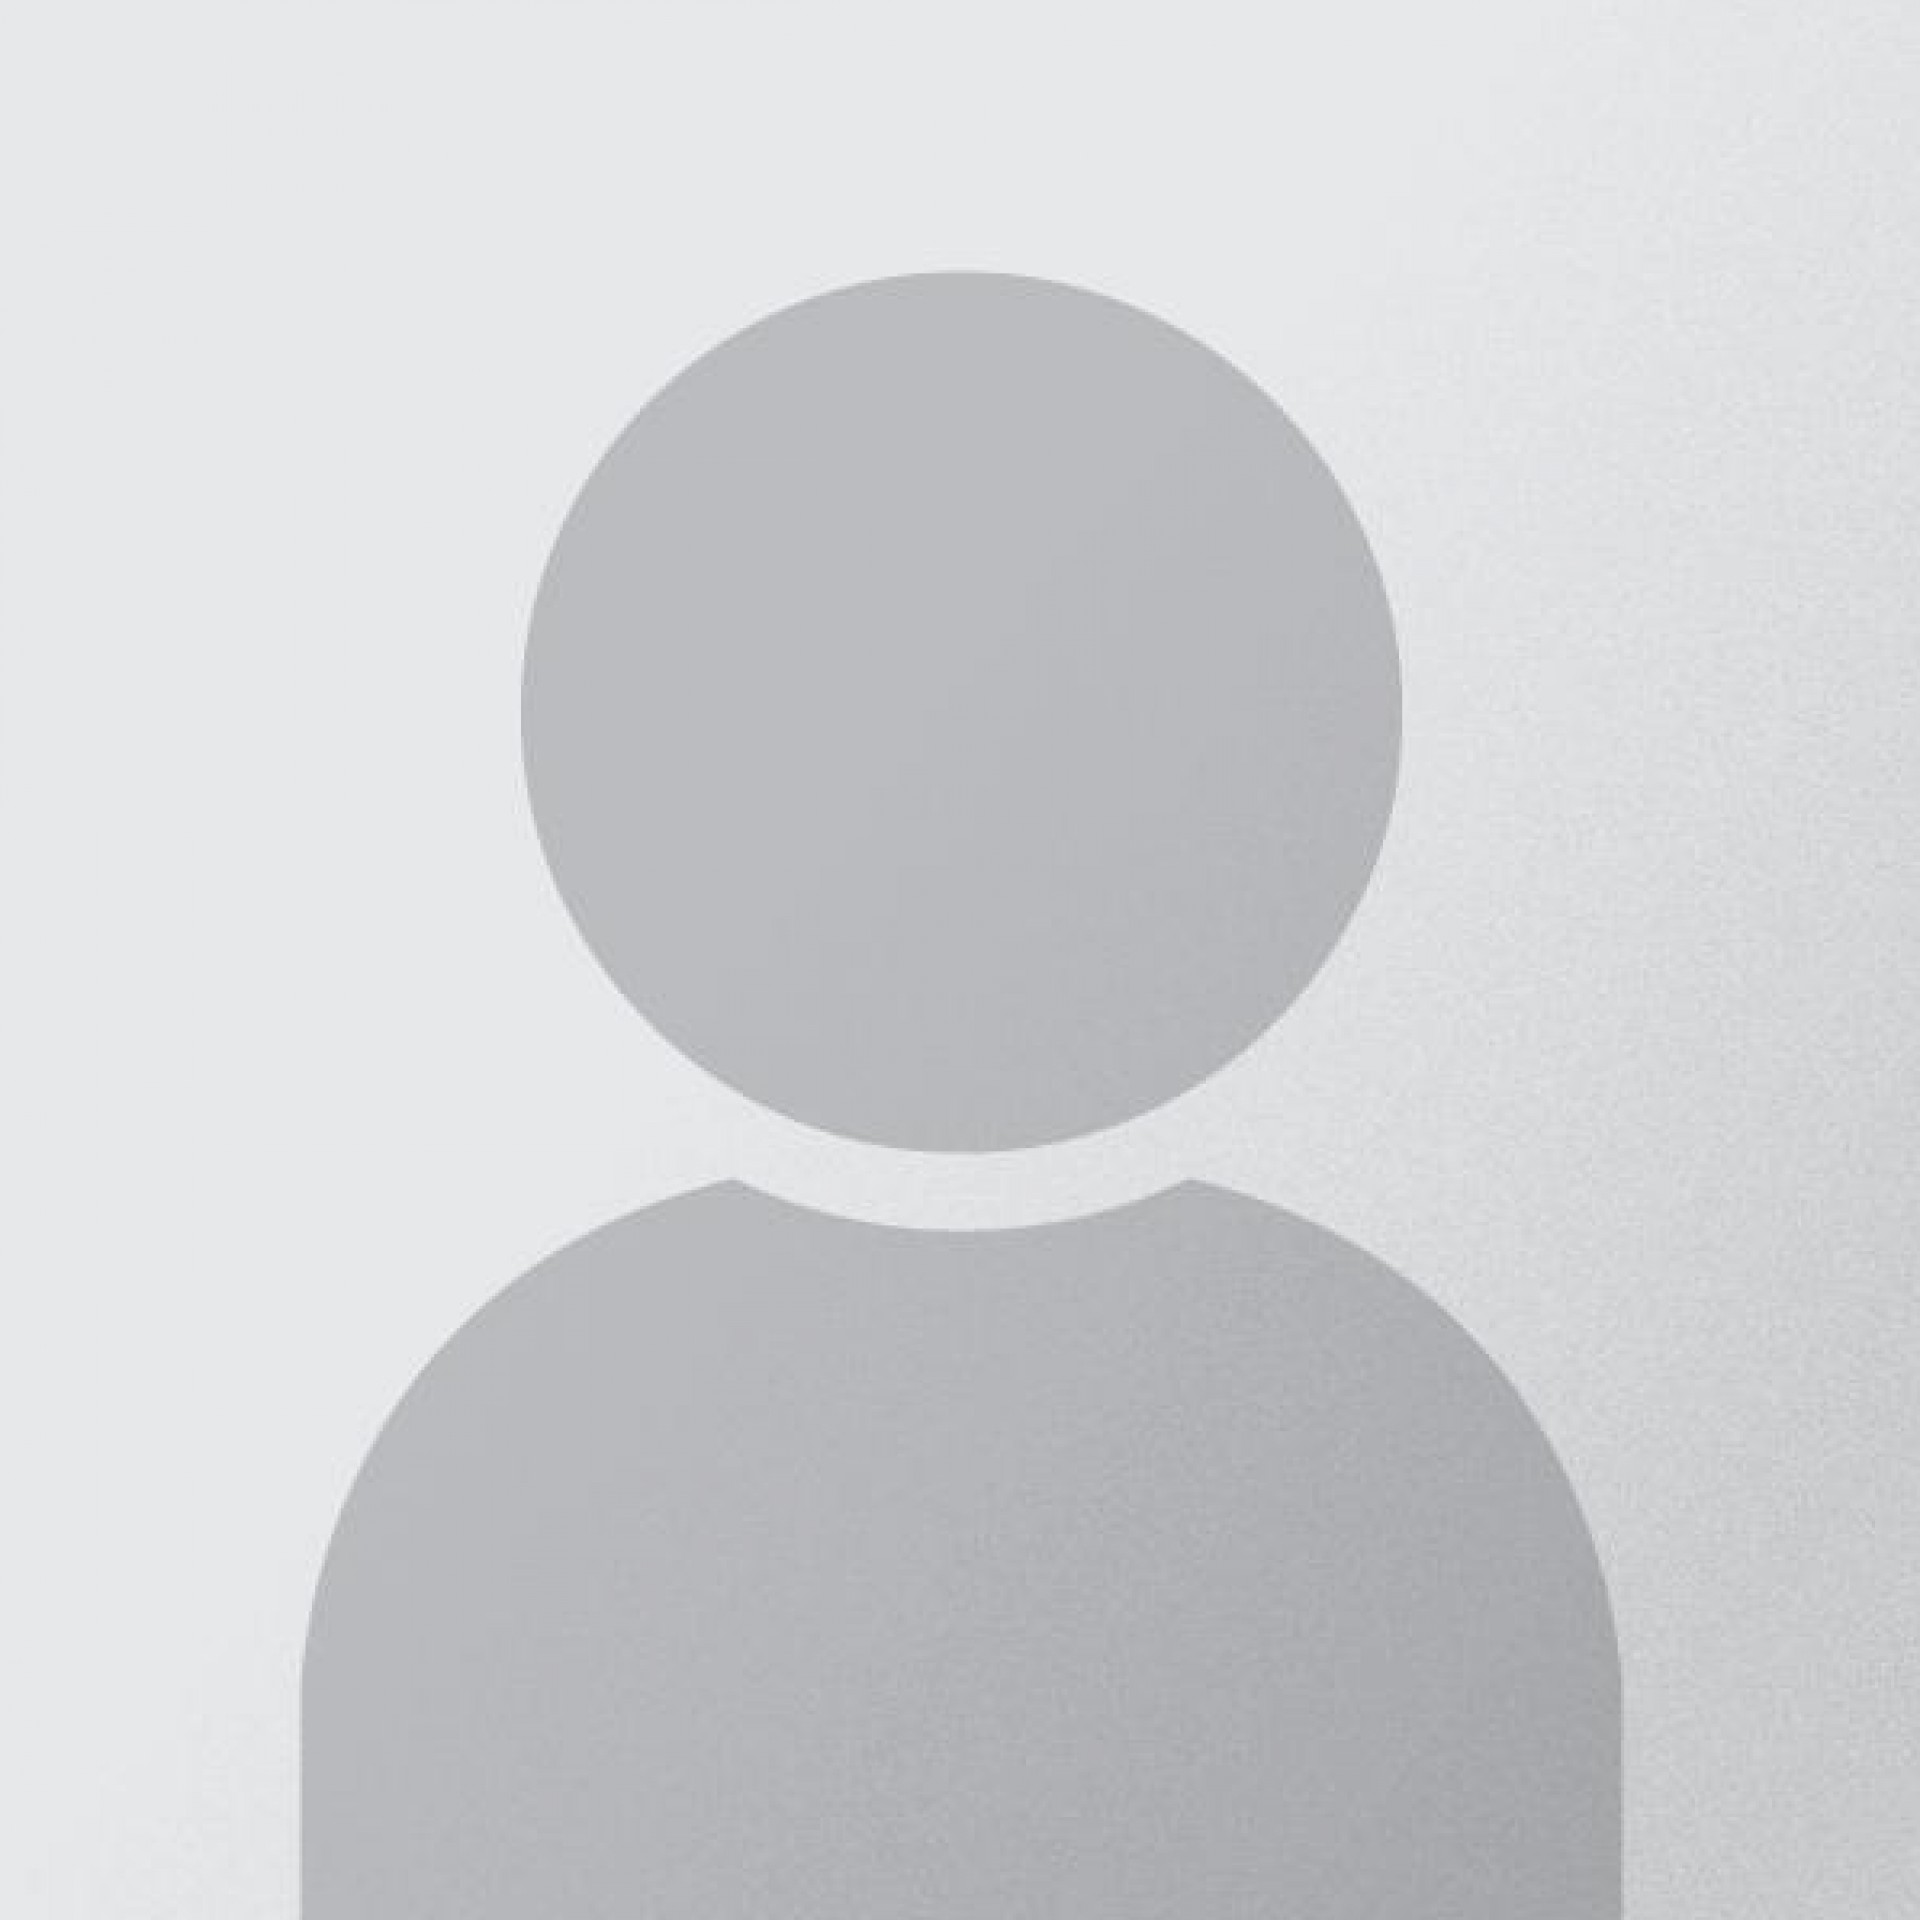 fotografia p021 profilu 0101MEAQ7C